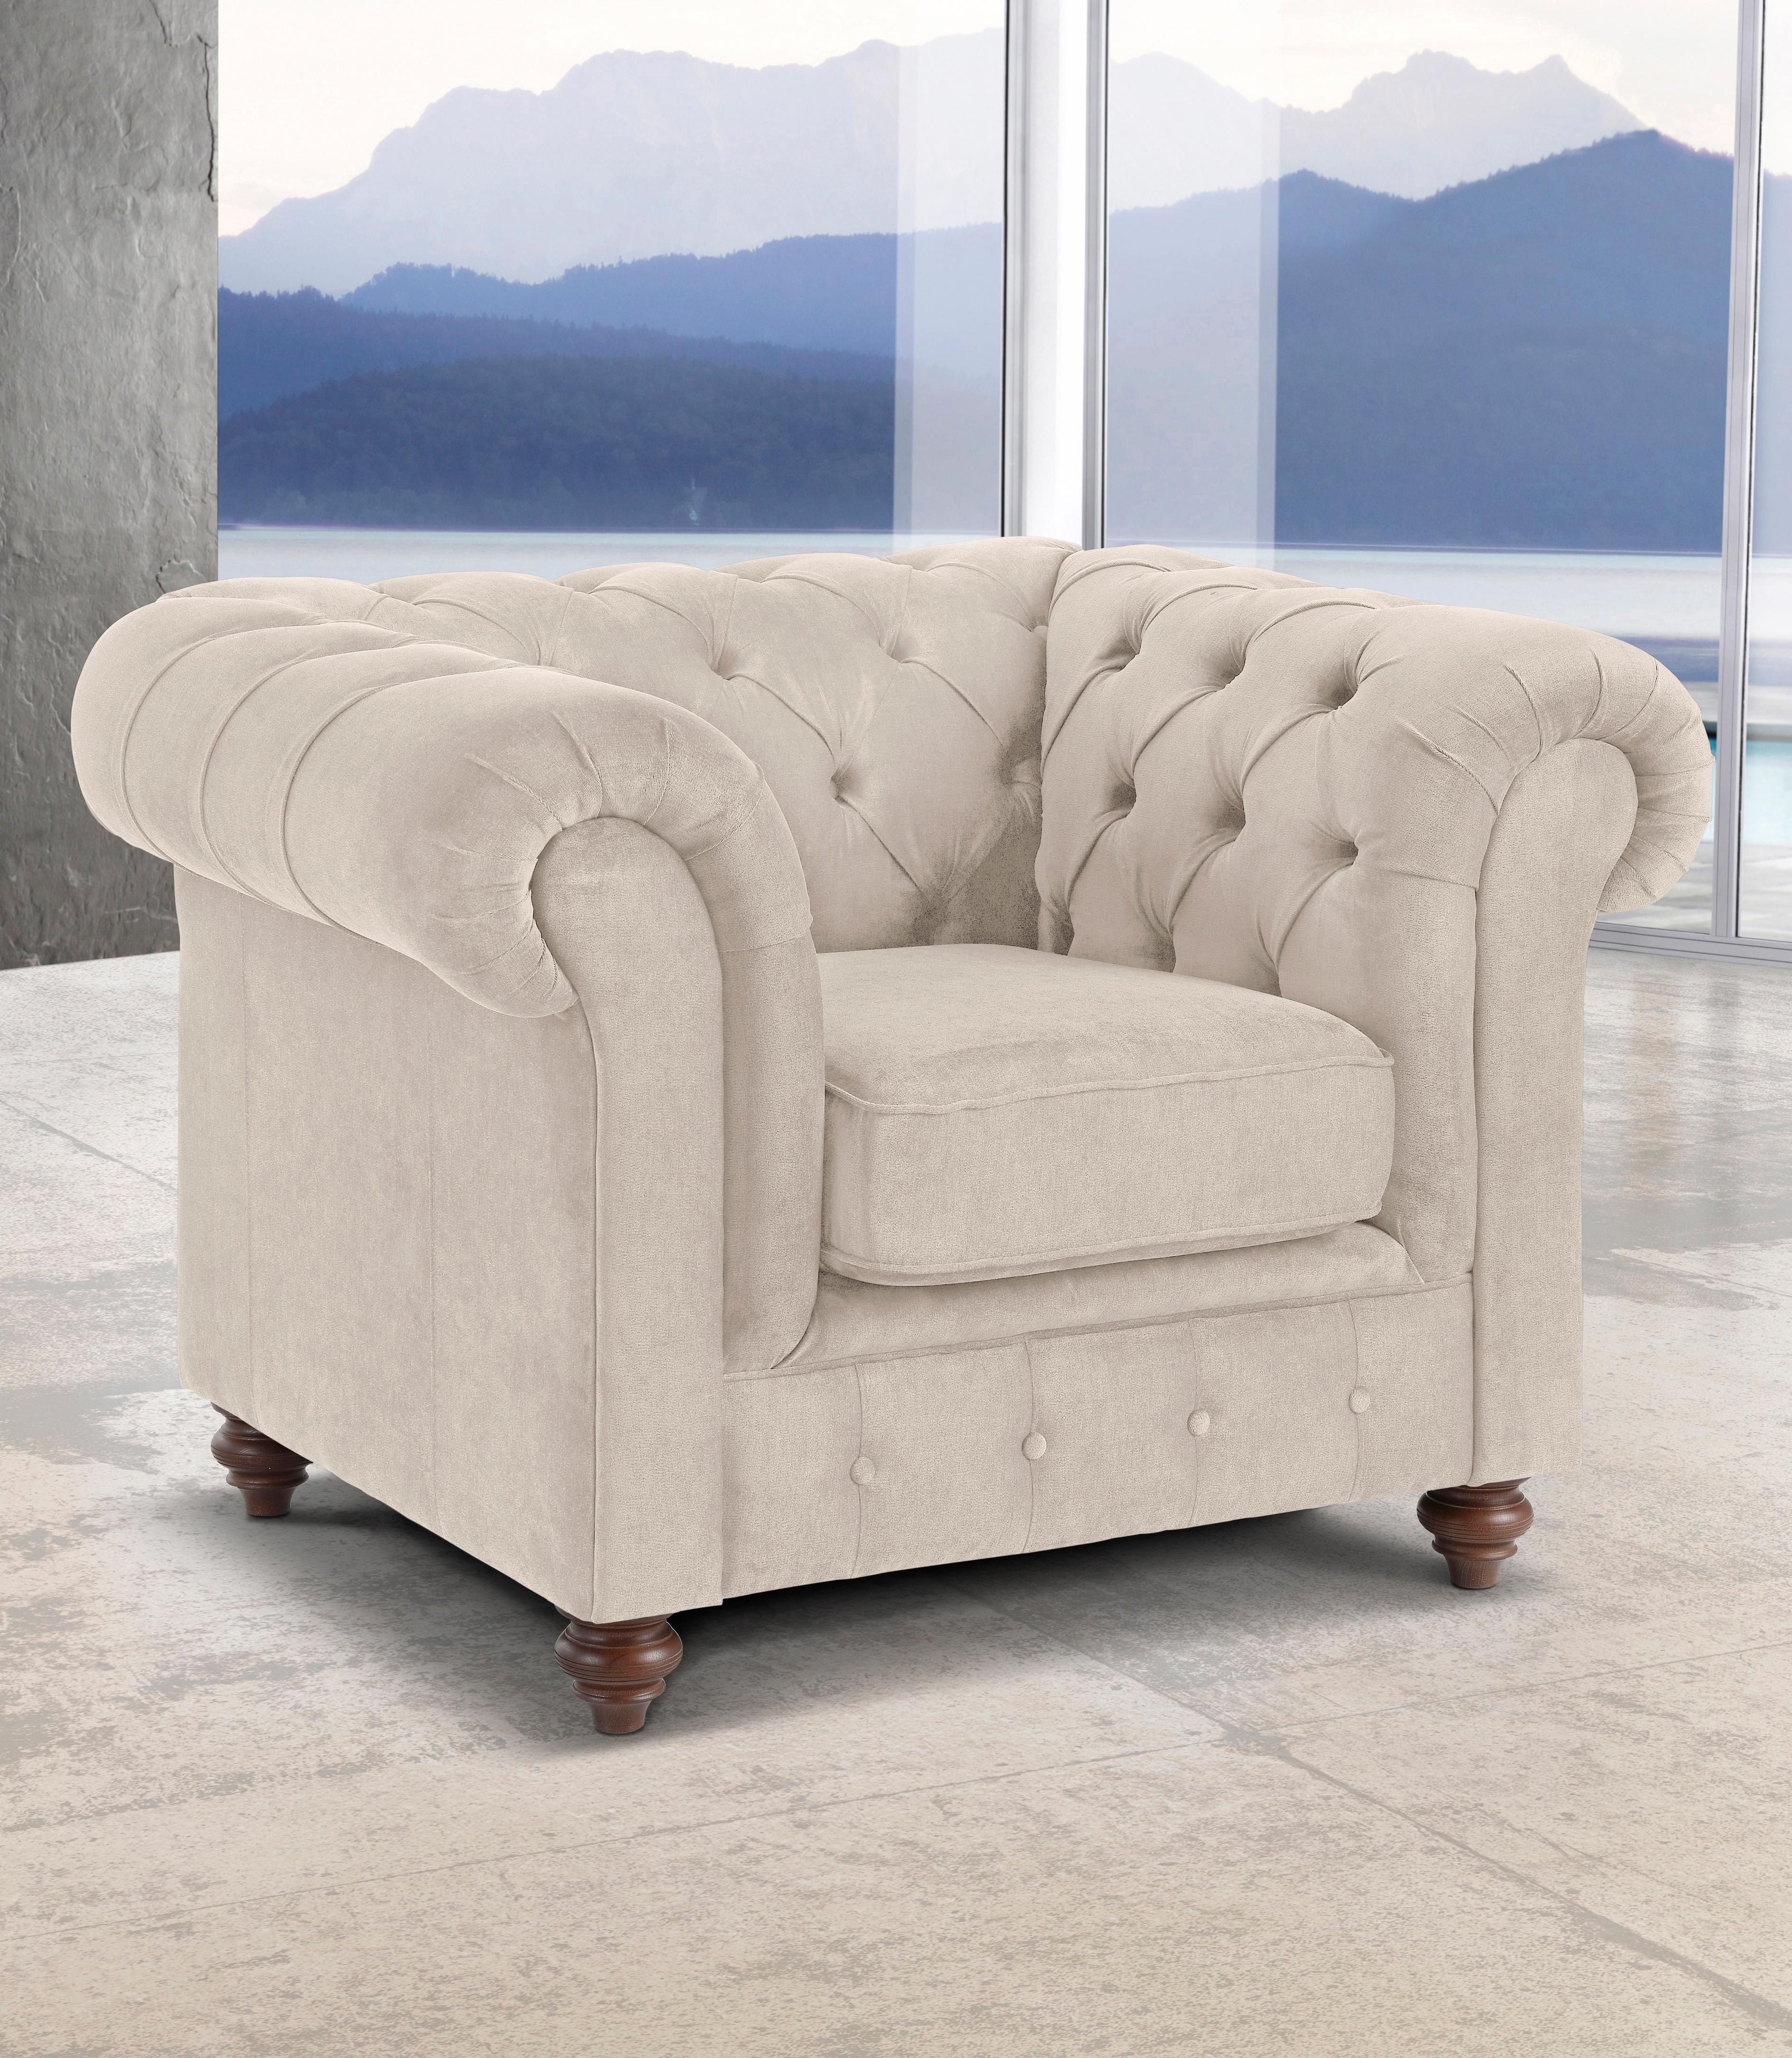 Premium Collection By Home Affaire fauteuil »Chesterfield« nu online bestellen